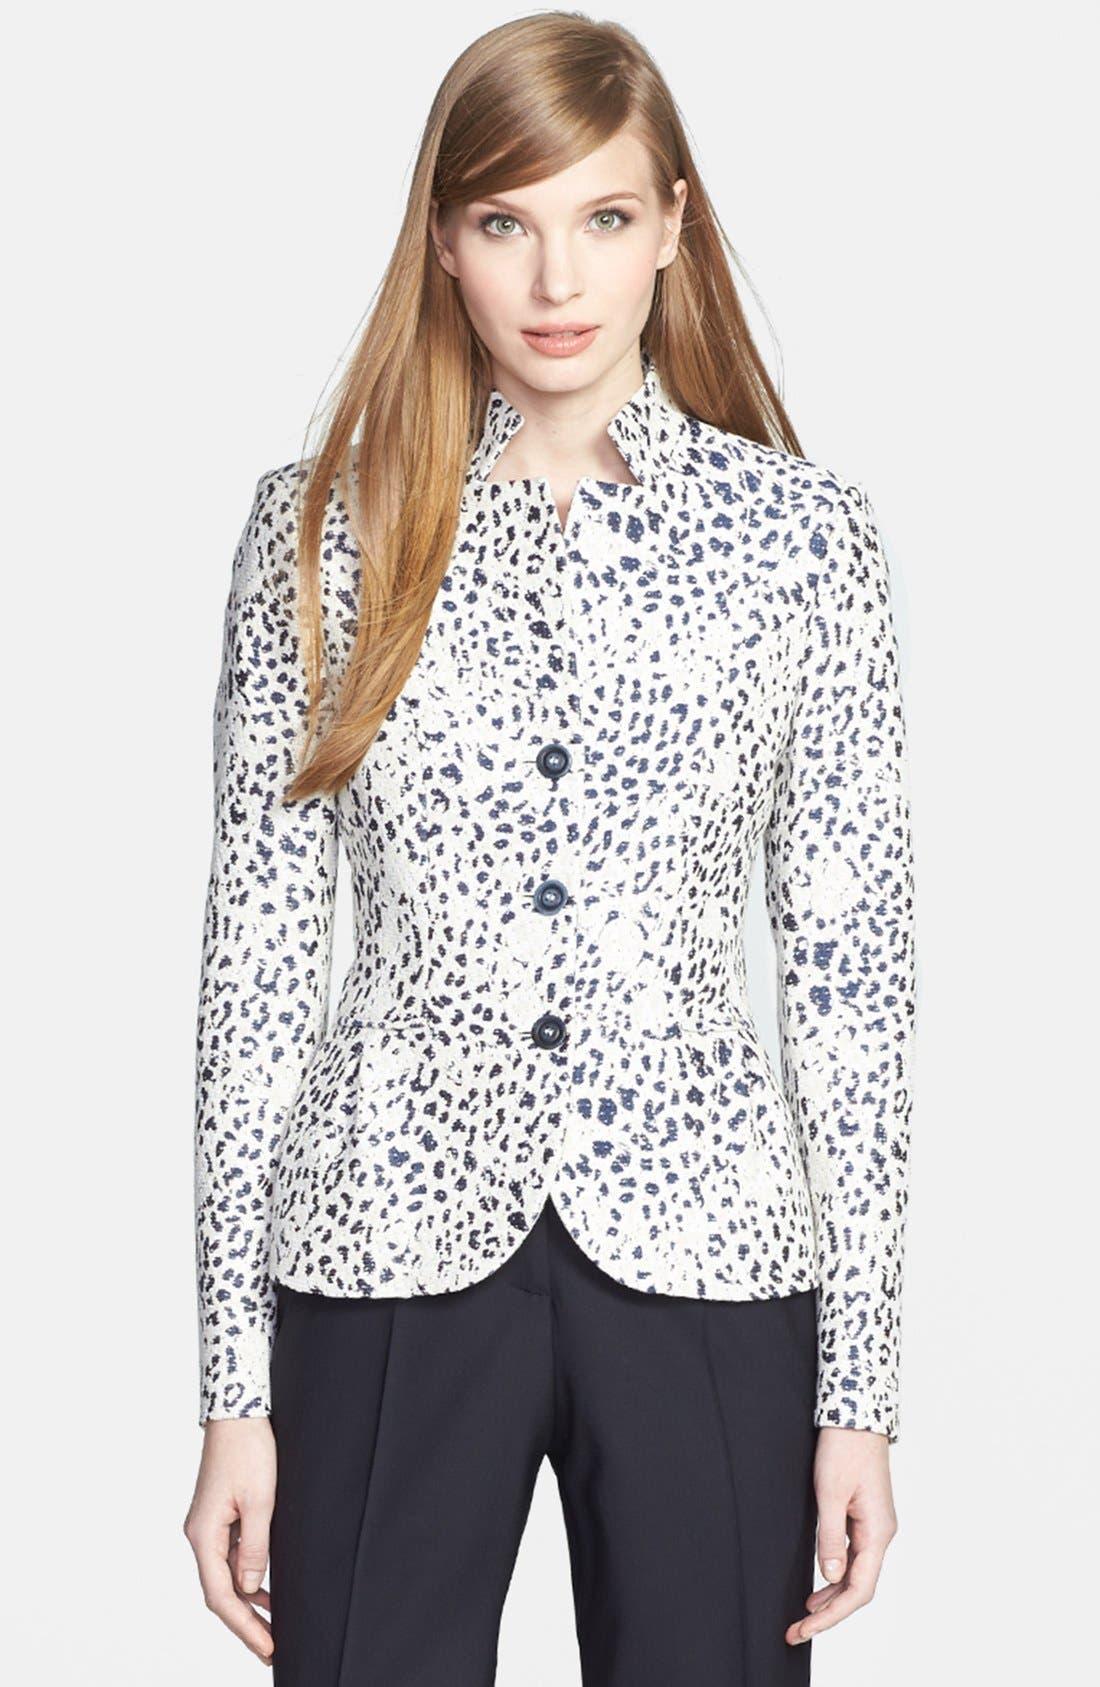 Alternate Image 1 Selected - Santorelli Leopard Jacquard Jacket